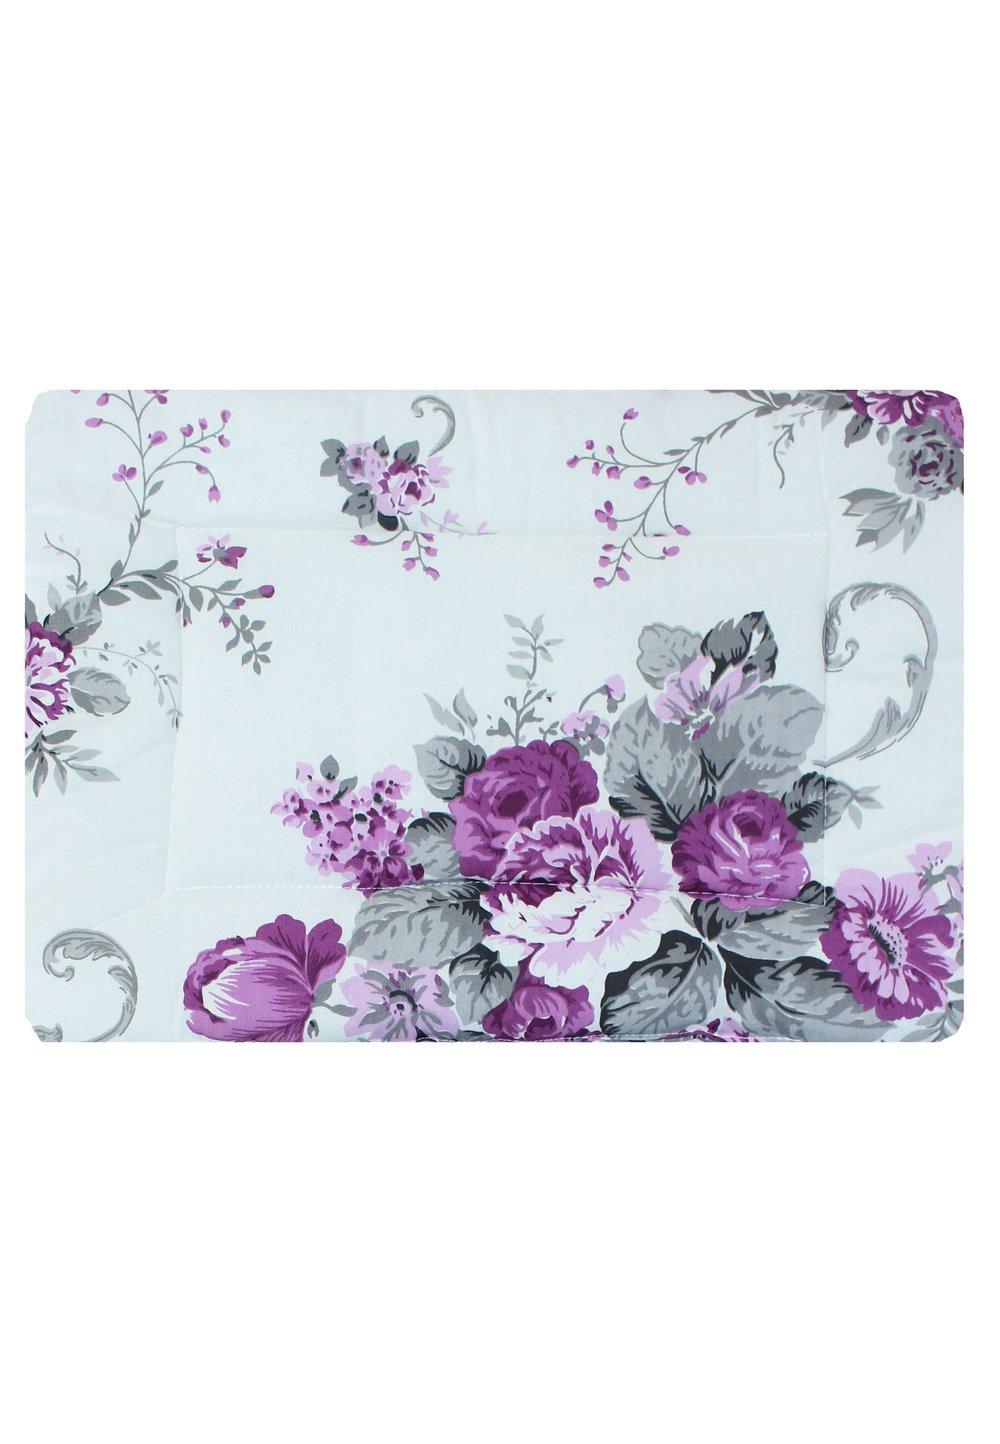 Perna slim, Purple flowers, 37x28cm imagine